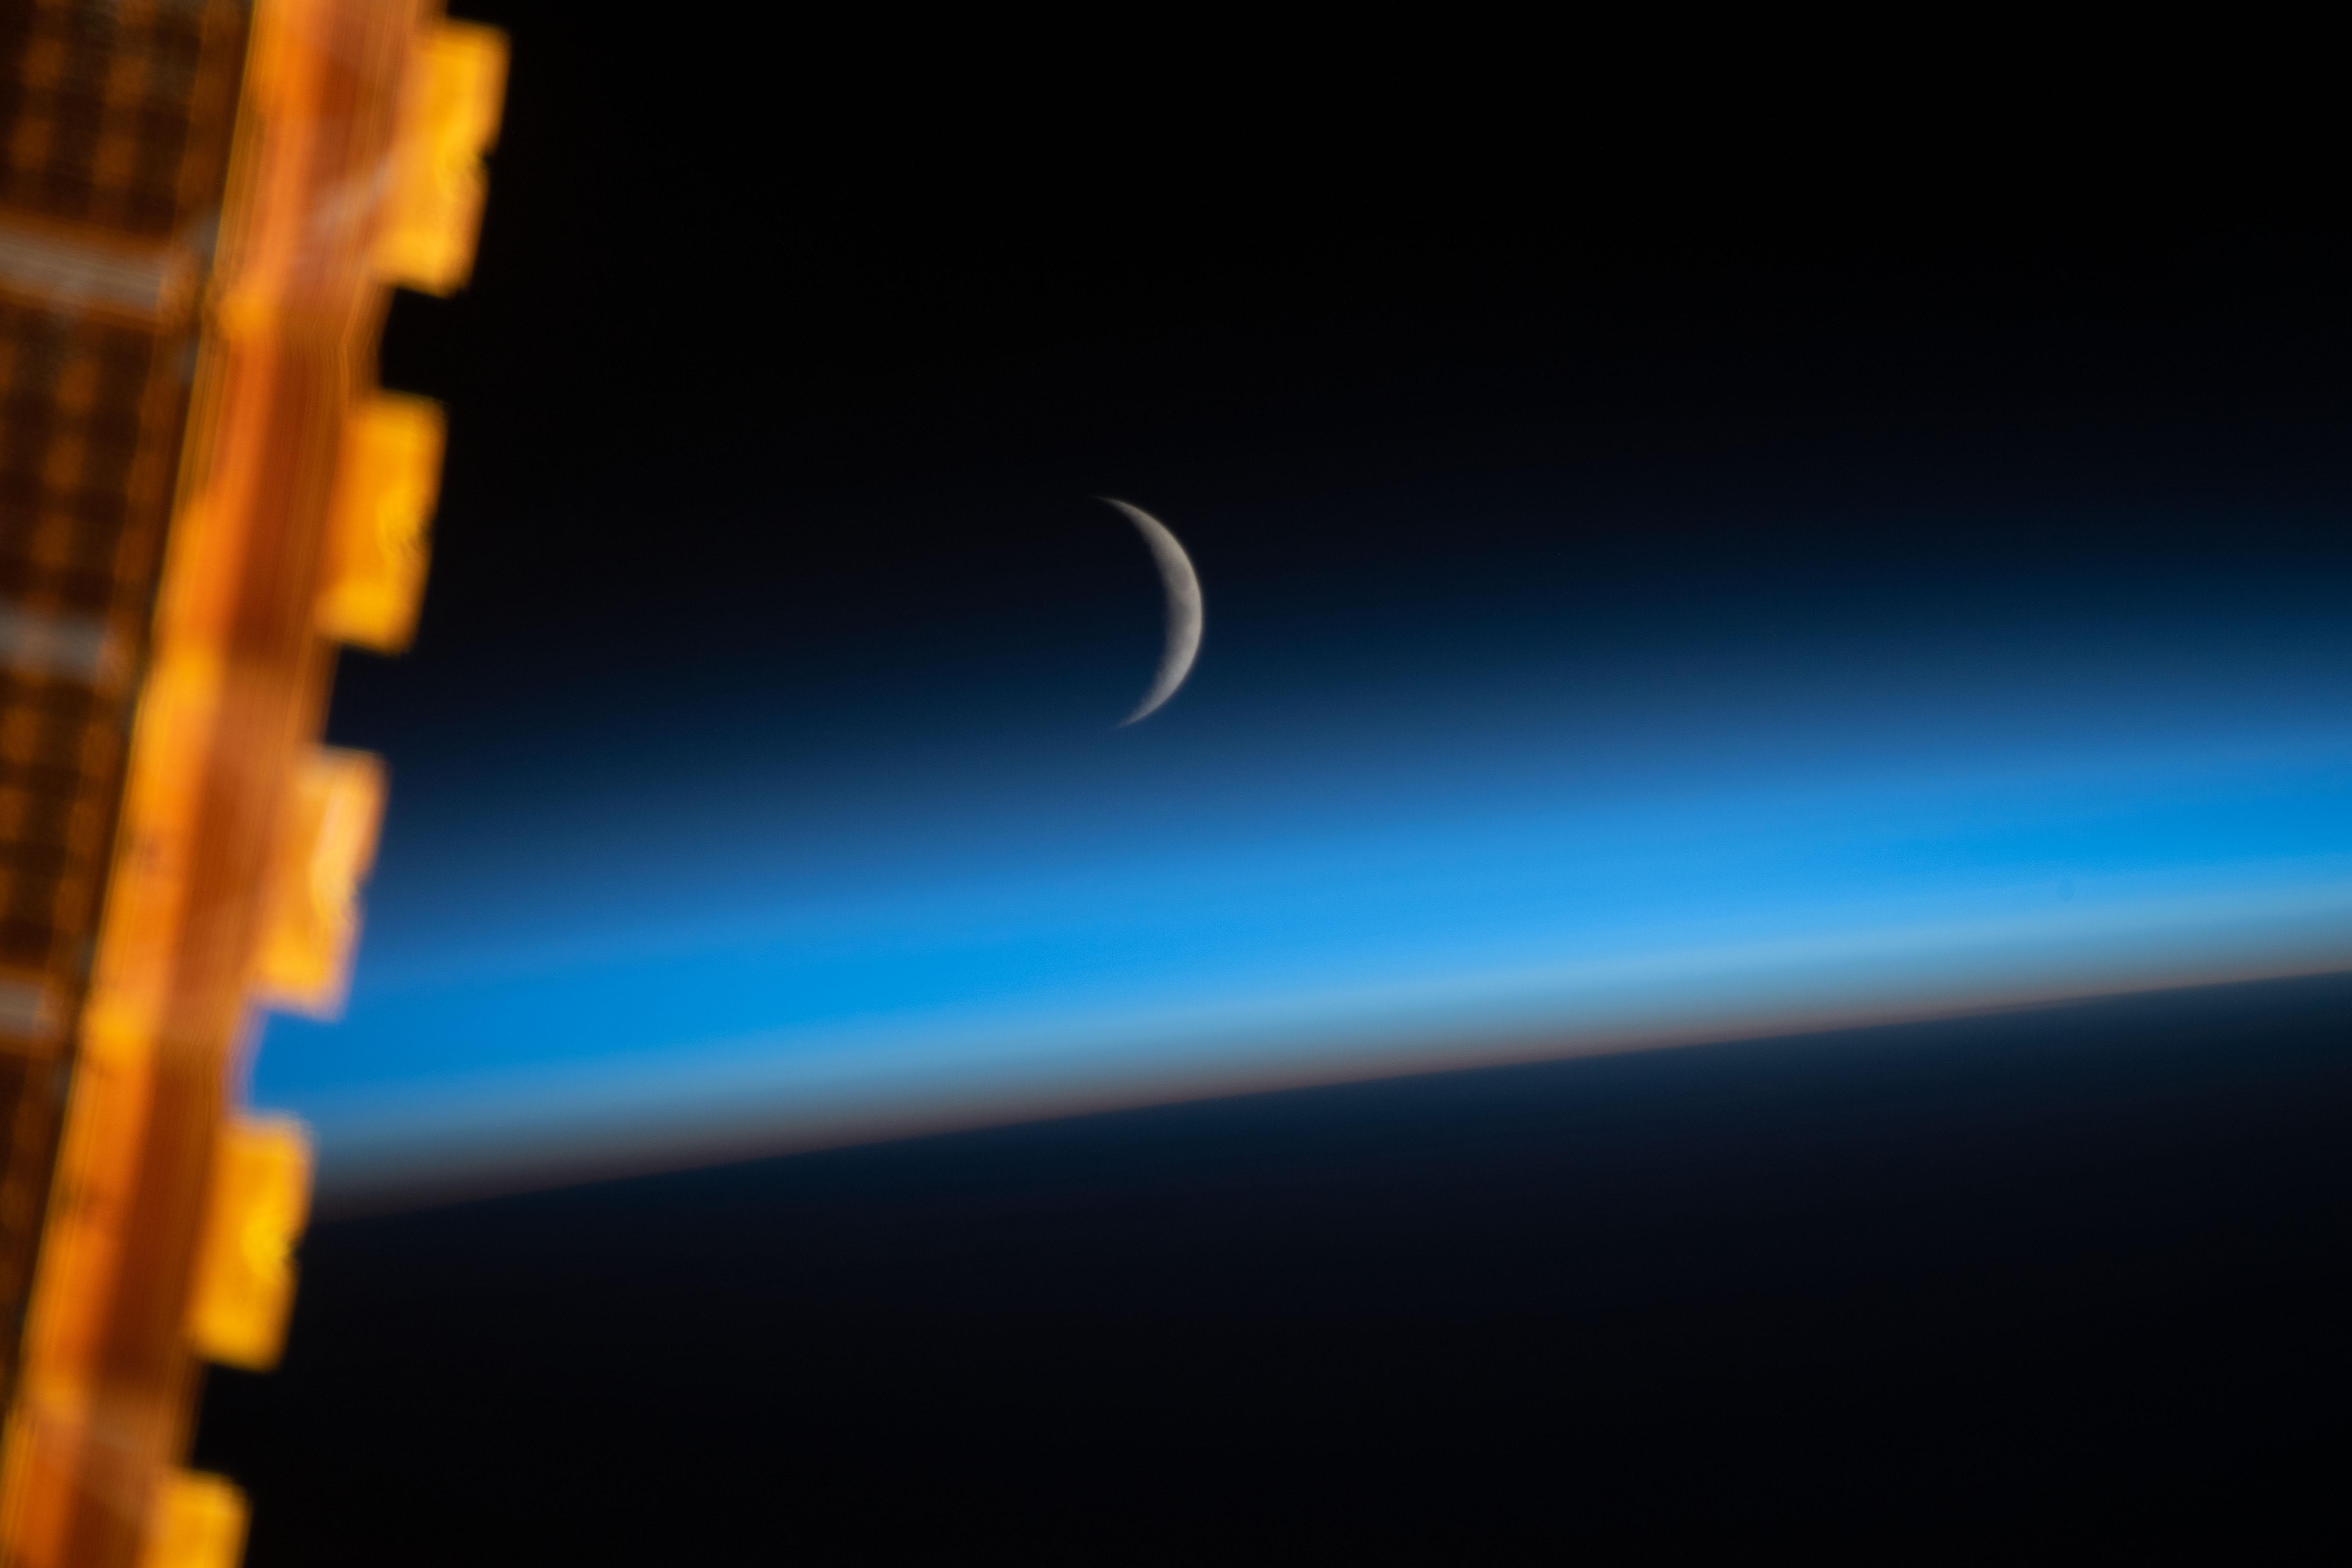 waxing crescent moon above